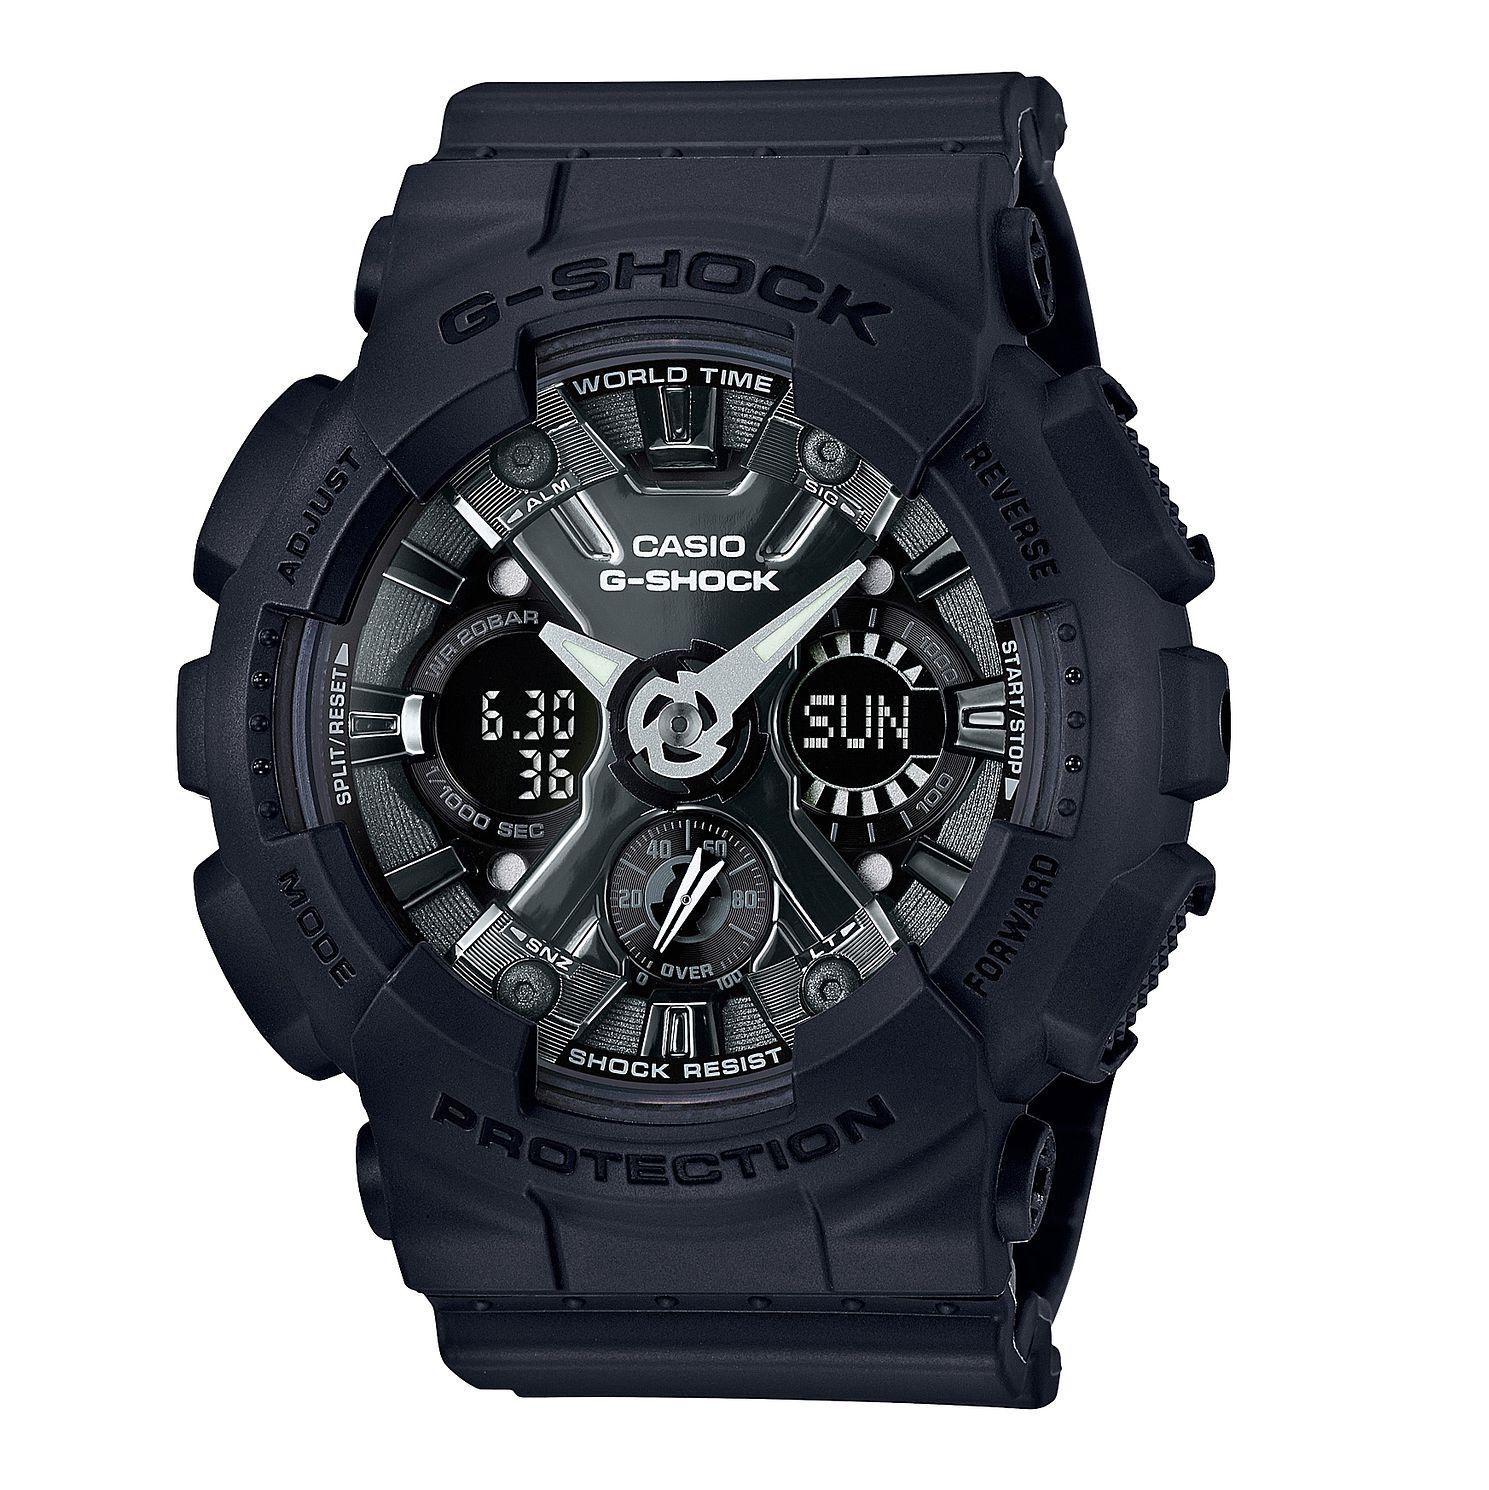 Casio G-Shock Shock Resistant World Time Black Resin Strap Watch, £50.99 at H.Samuel